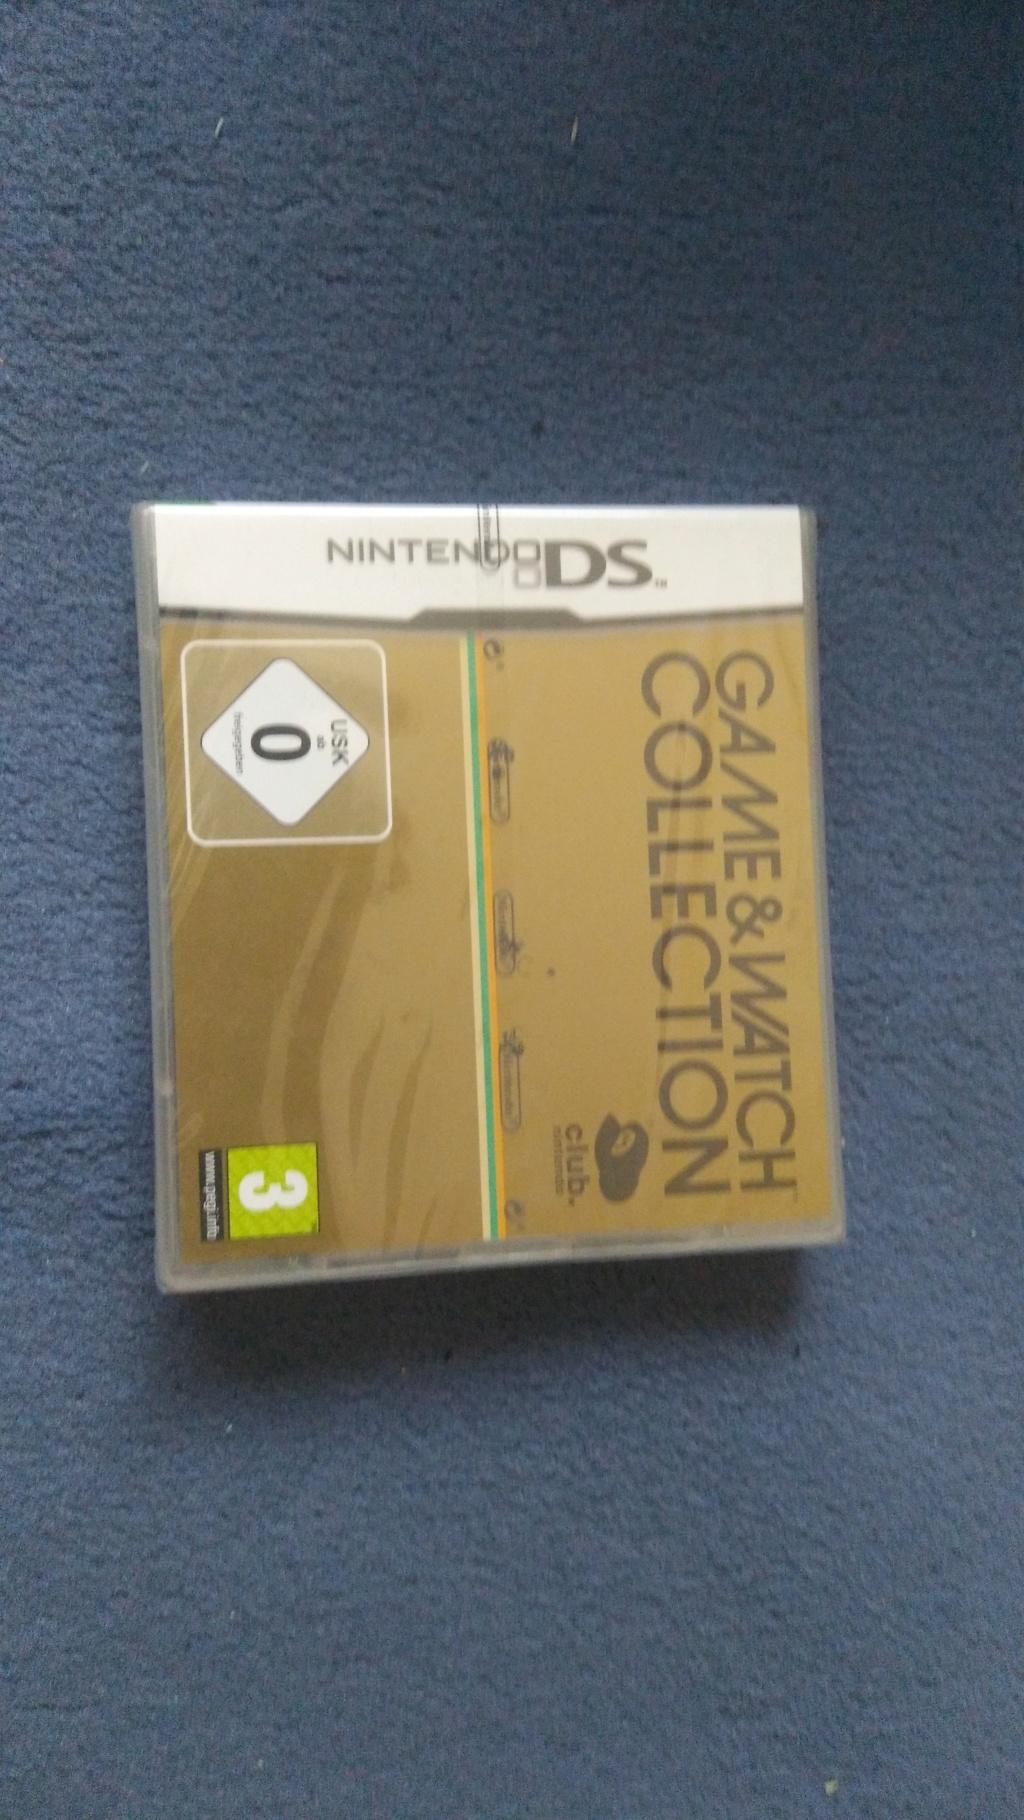 Game & Watch Collection neuf pour Nintendo DS, boites de jeux DS... Img_2020